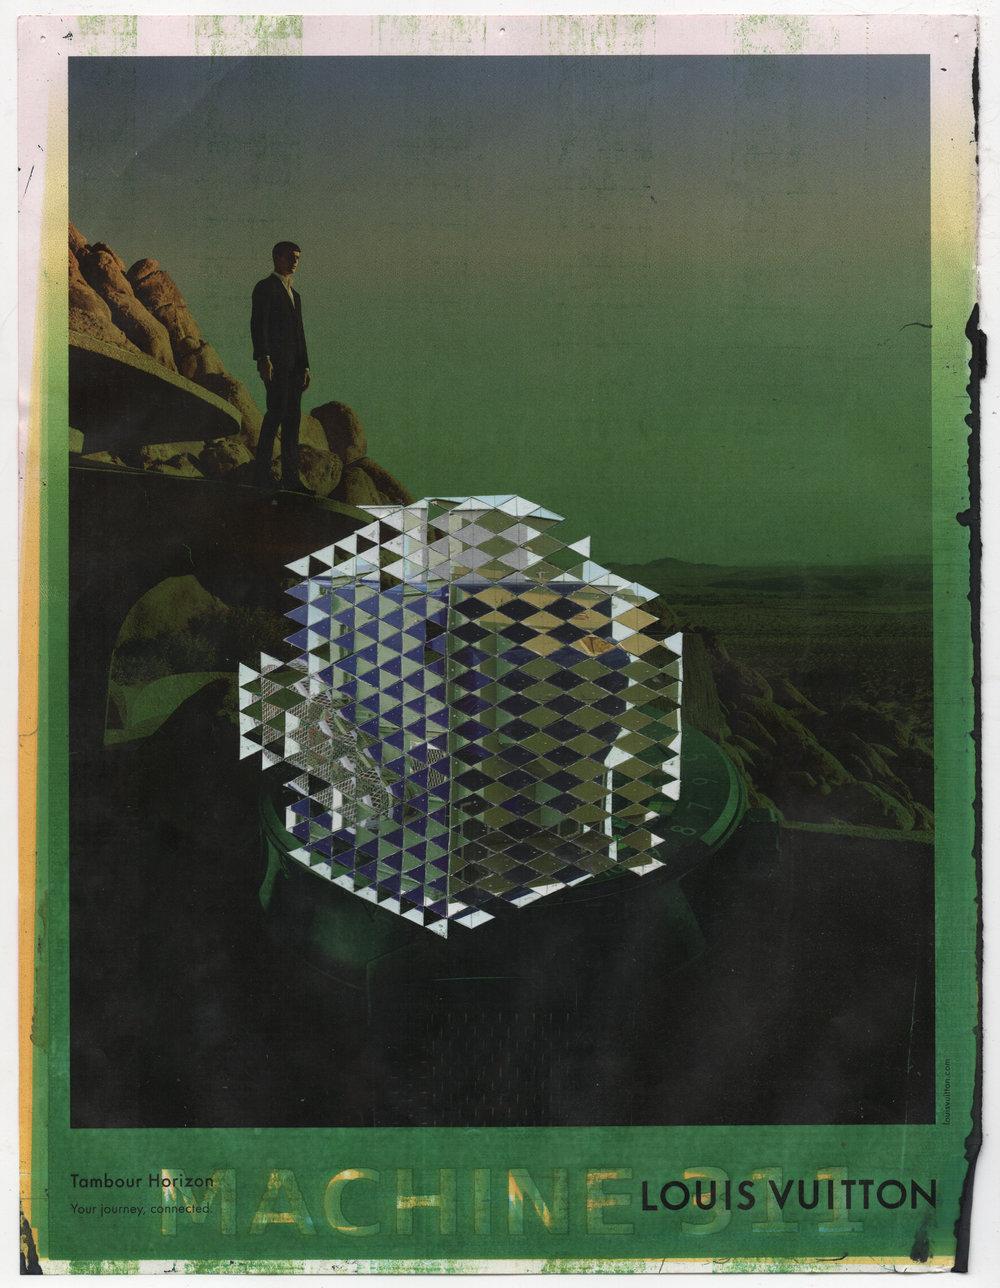 Peach Machine 311 (TQSC), 2018, catalog - inkjet on magazine page, 26.7 x 20.5 cm.